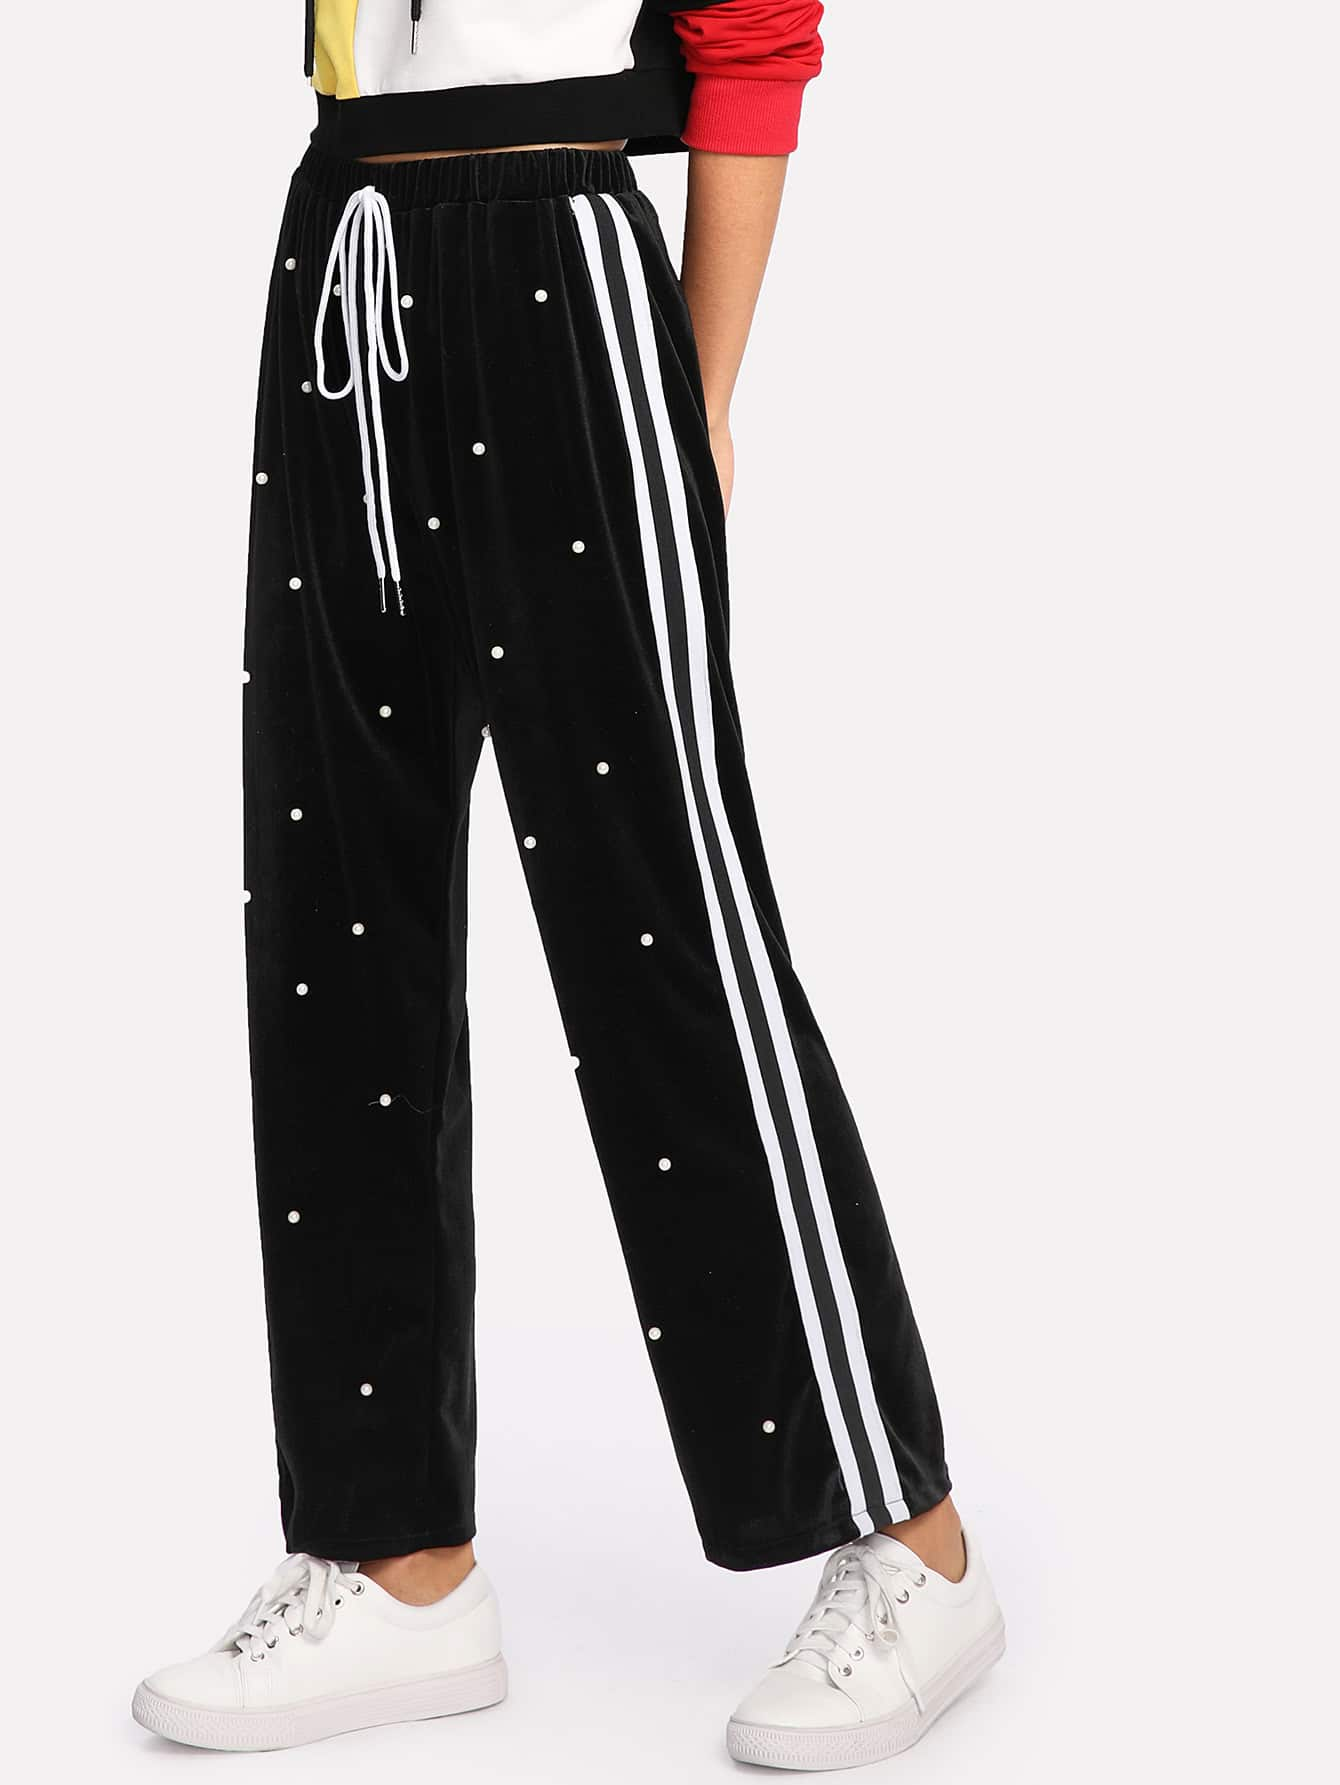 Striped Tape Side Pearl Beading Velvet Sweatpants striped tape side cuffed pants